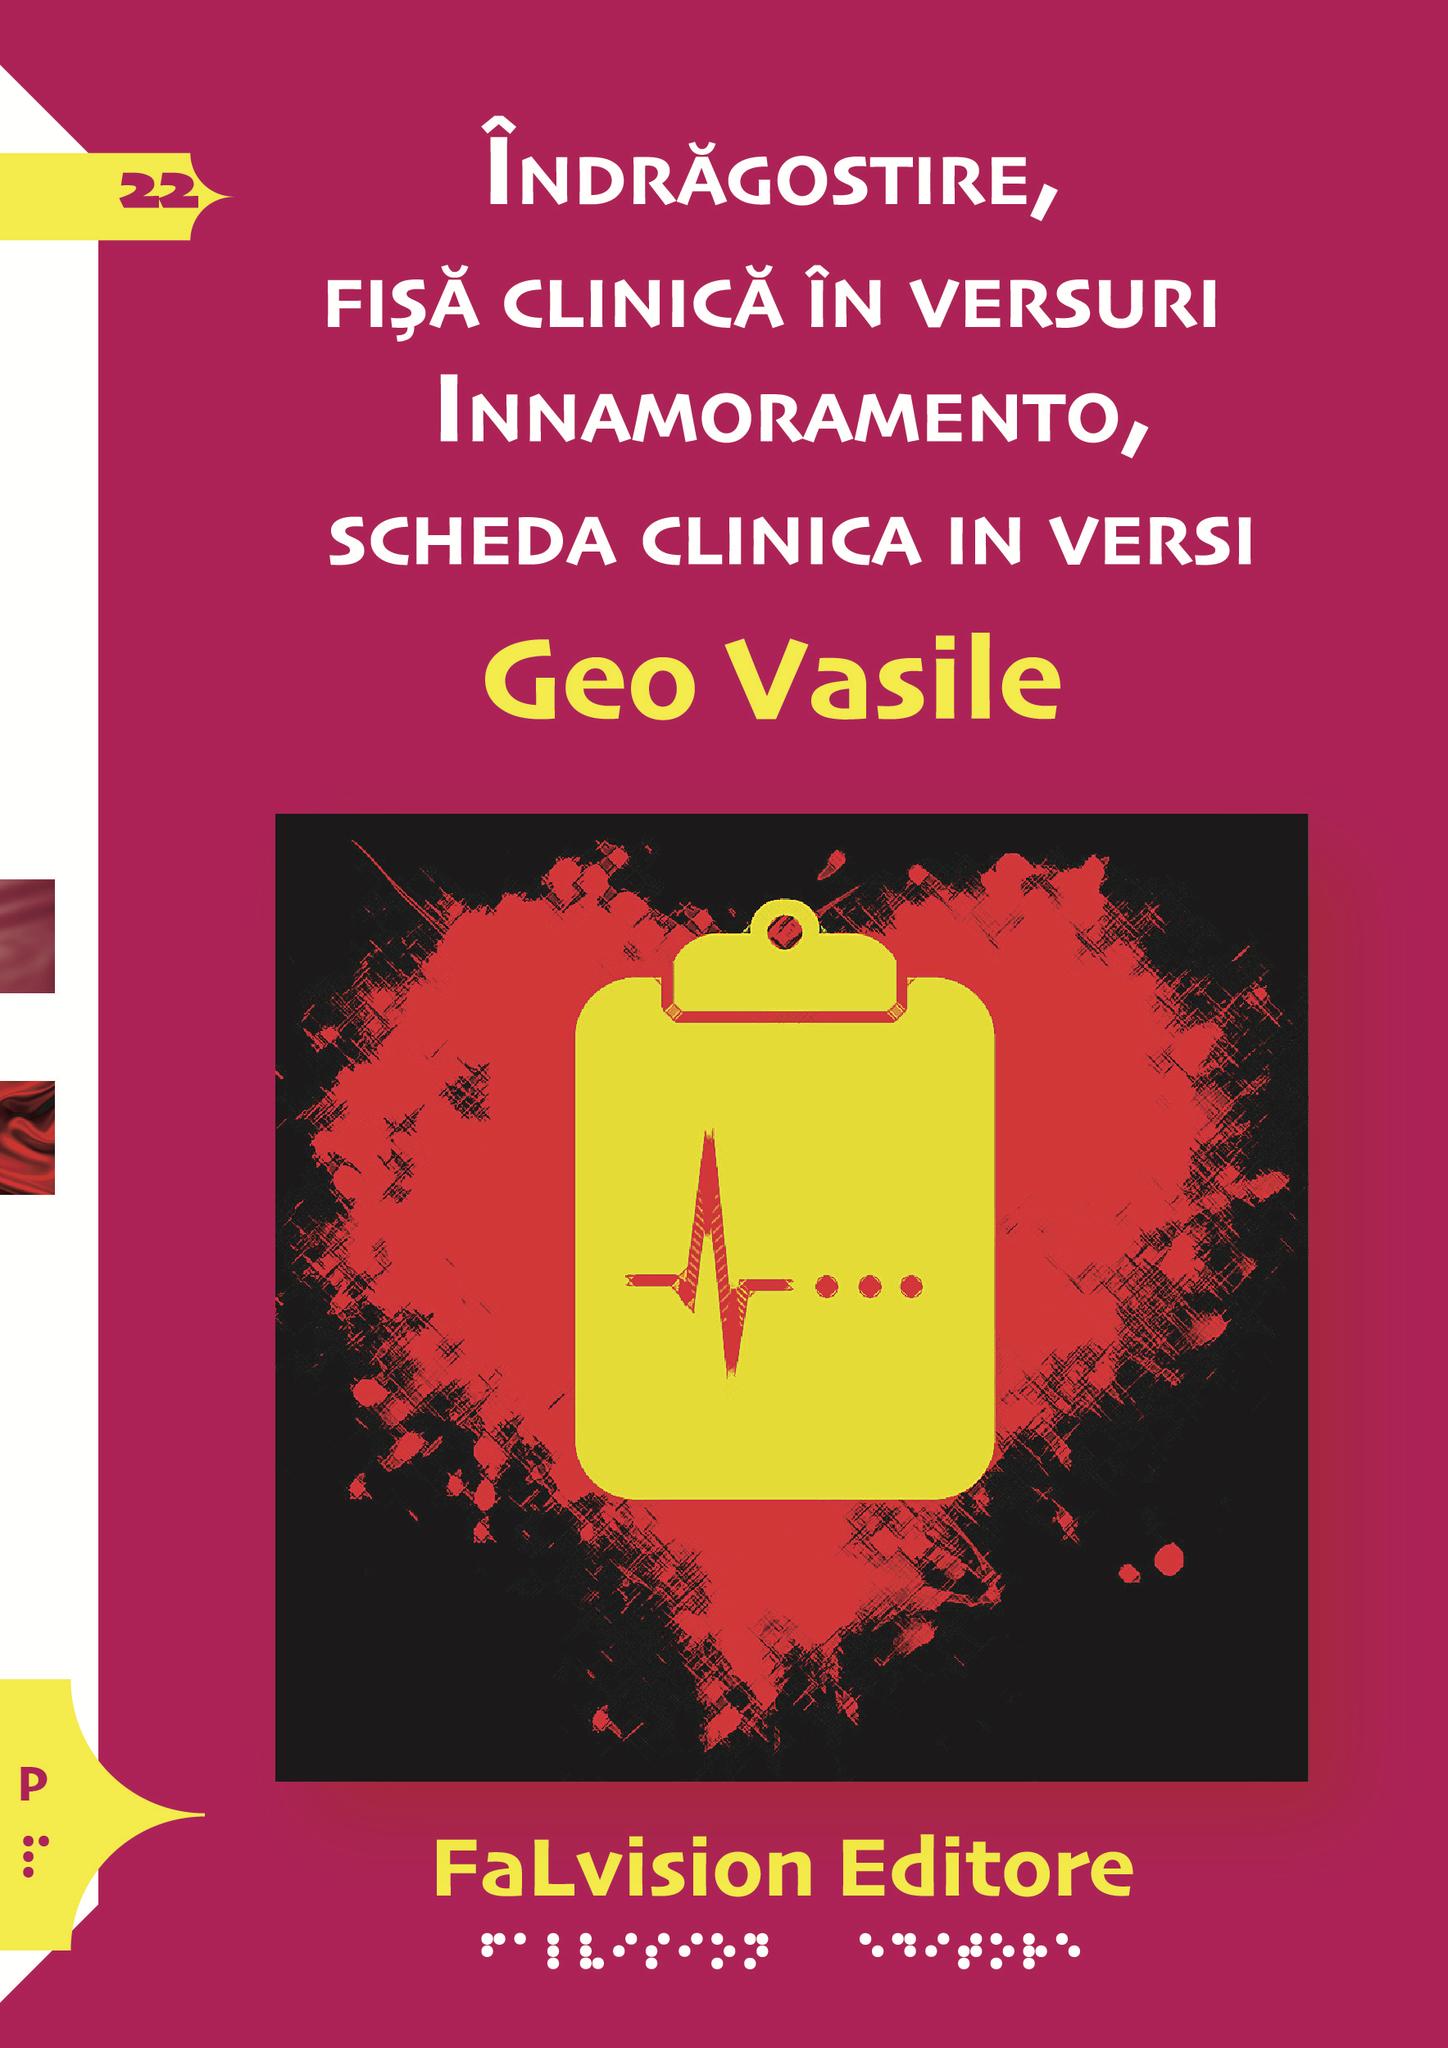 Innamoramento, scheda clinica in versi. Geo Vasile